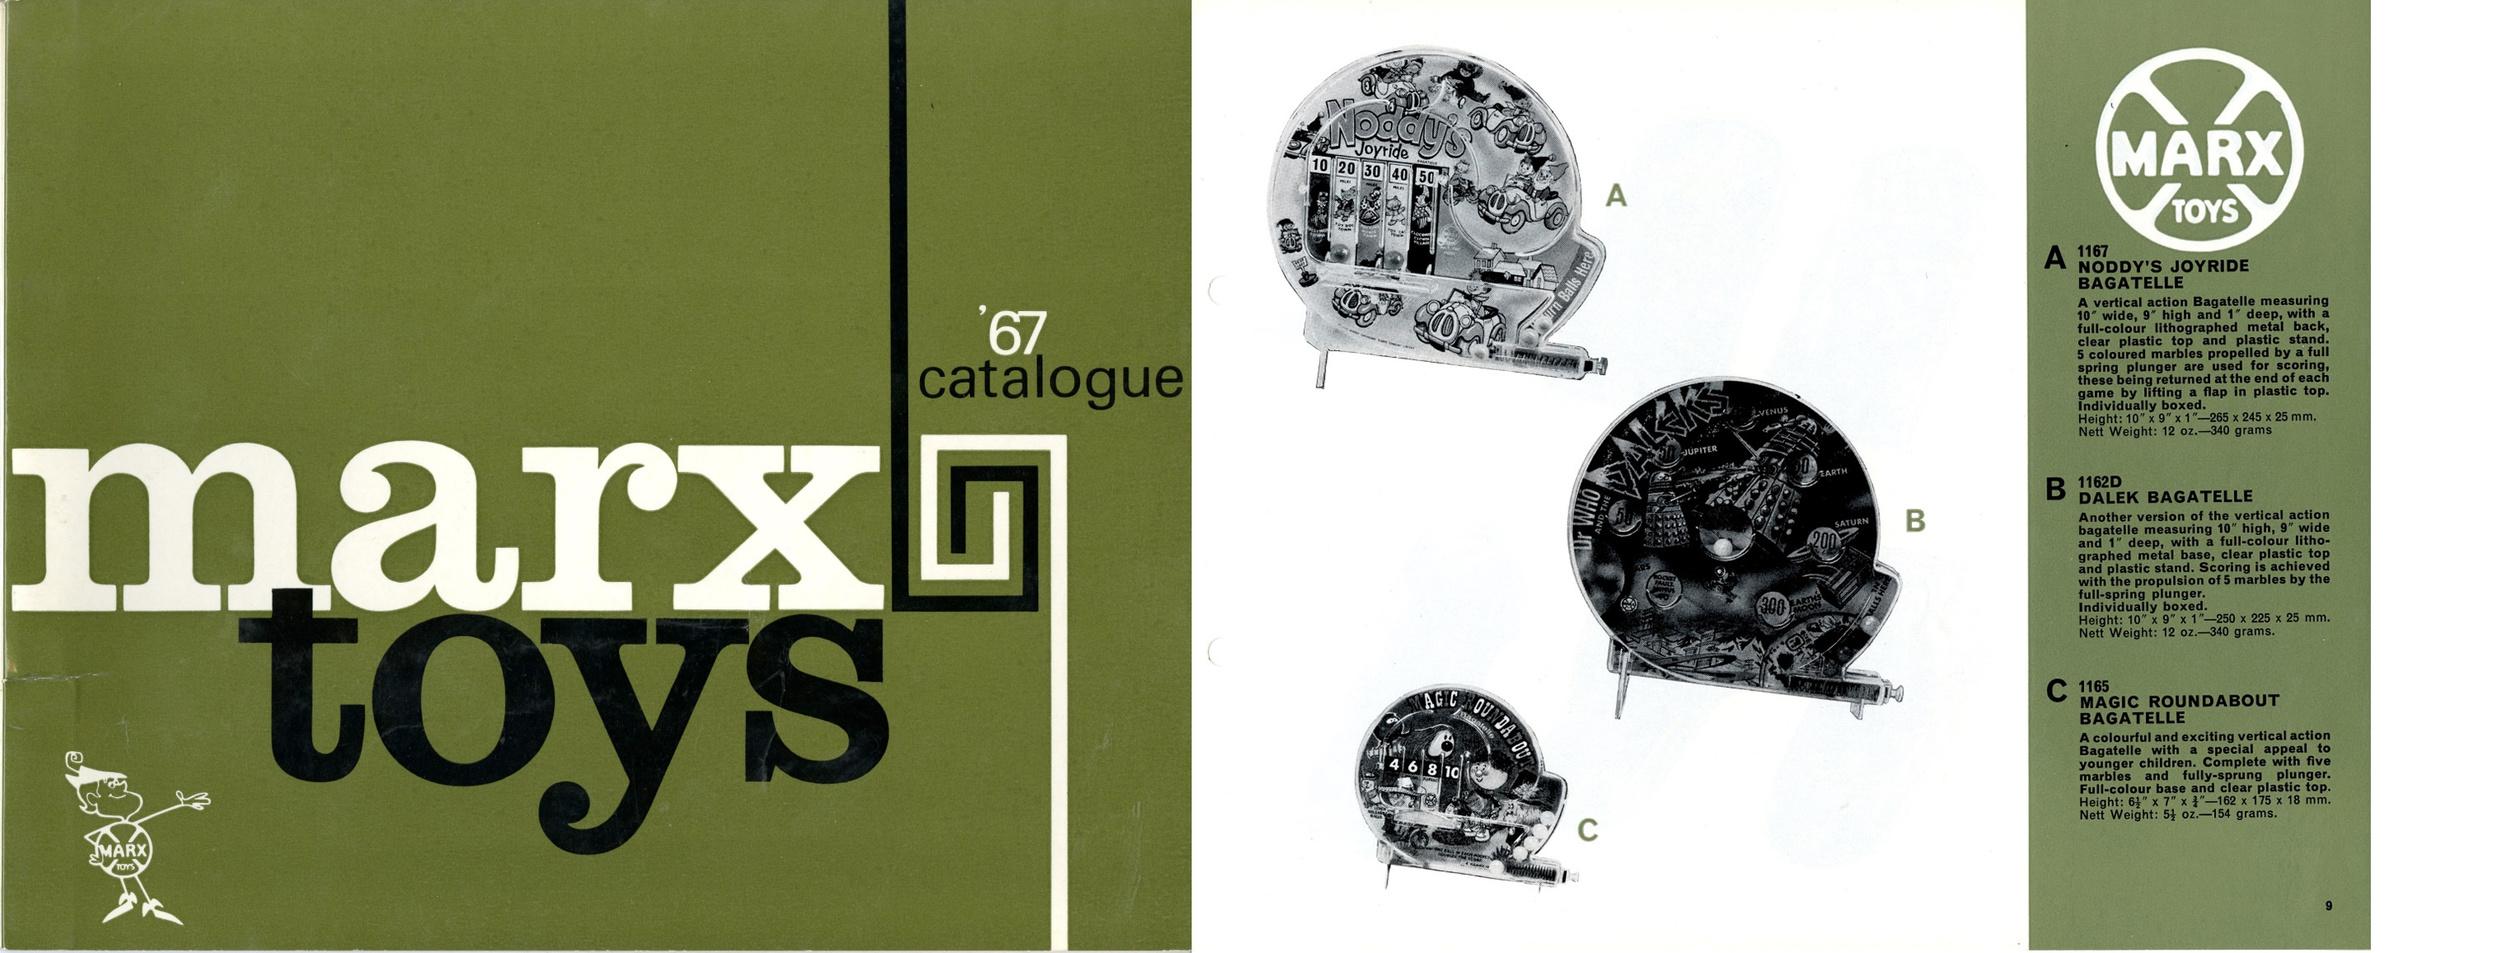 Louis Marx and Company Ltd. 1967 Catalogue including vertical Dalek Bagatelle